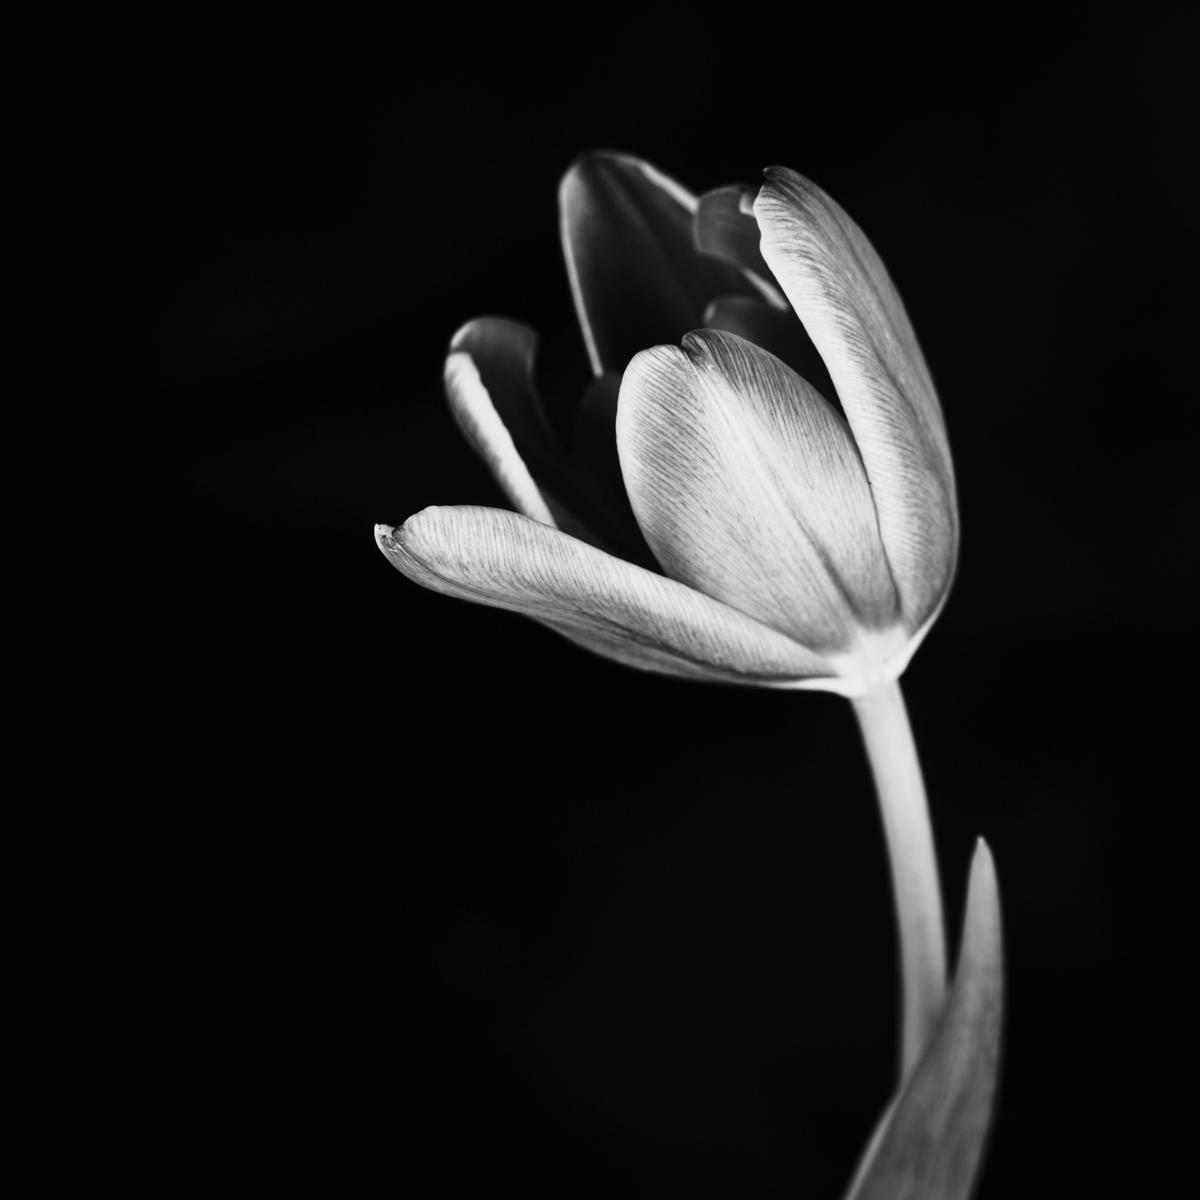 Tulip #165 (large view)